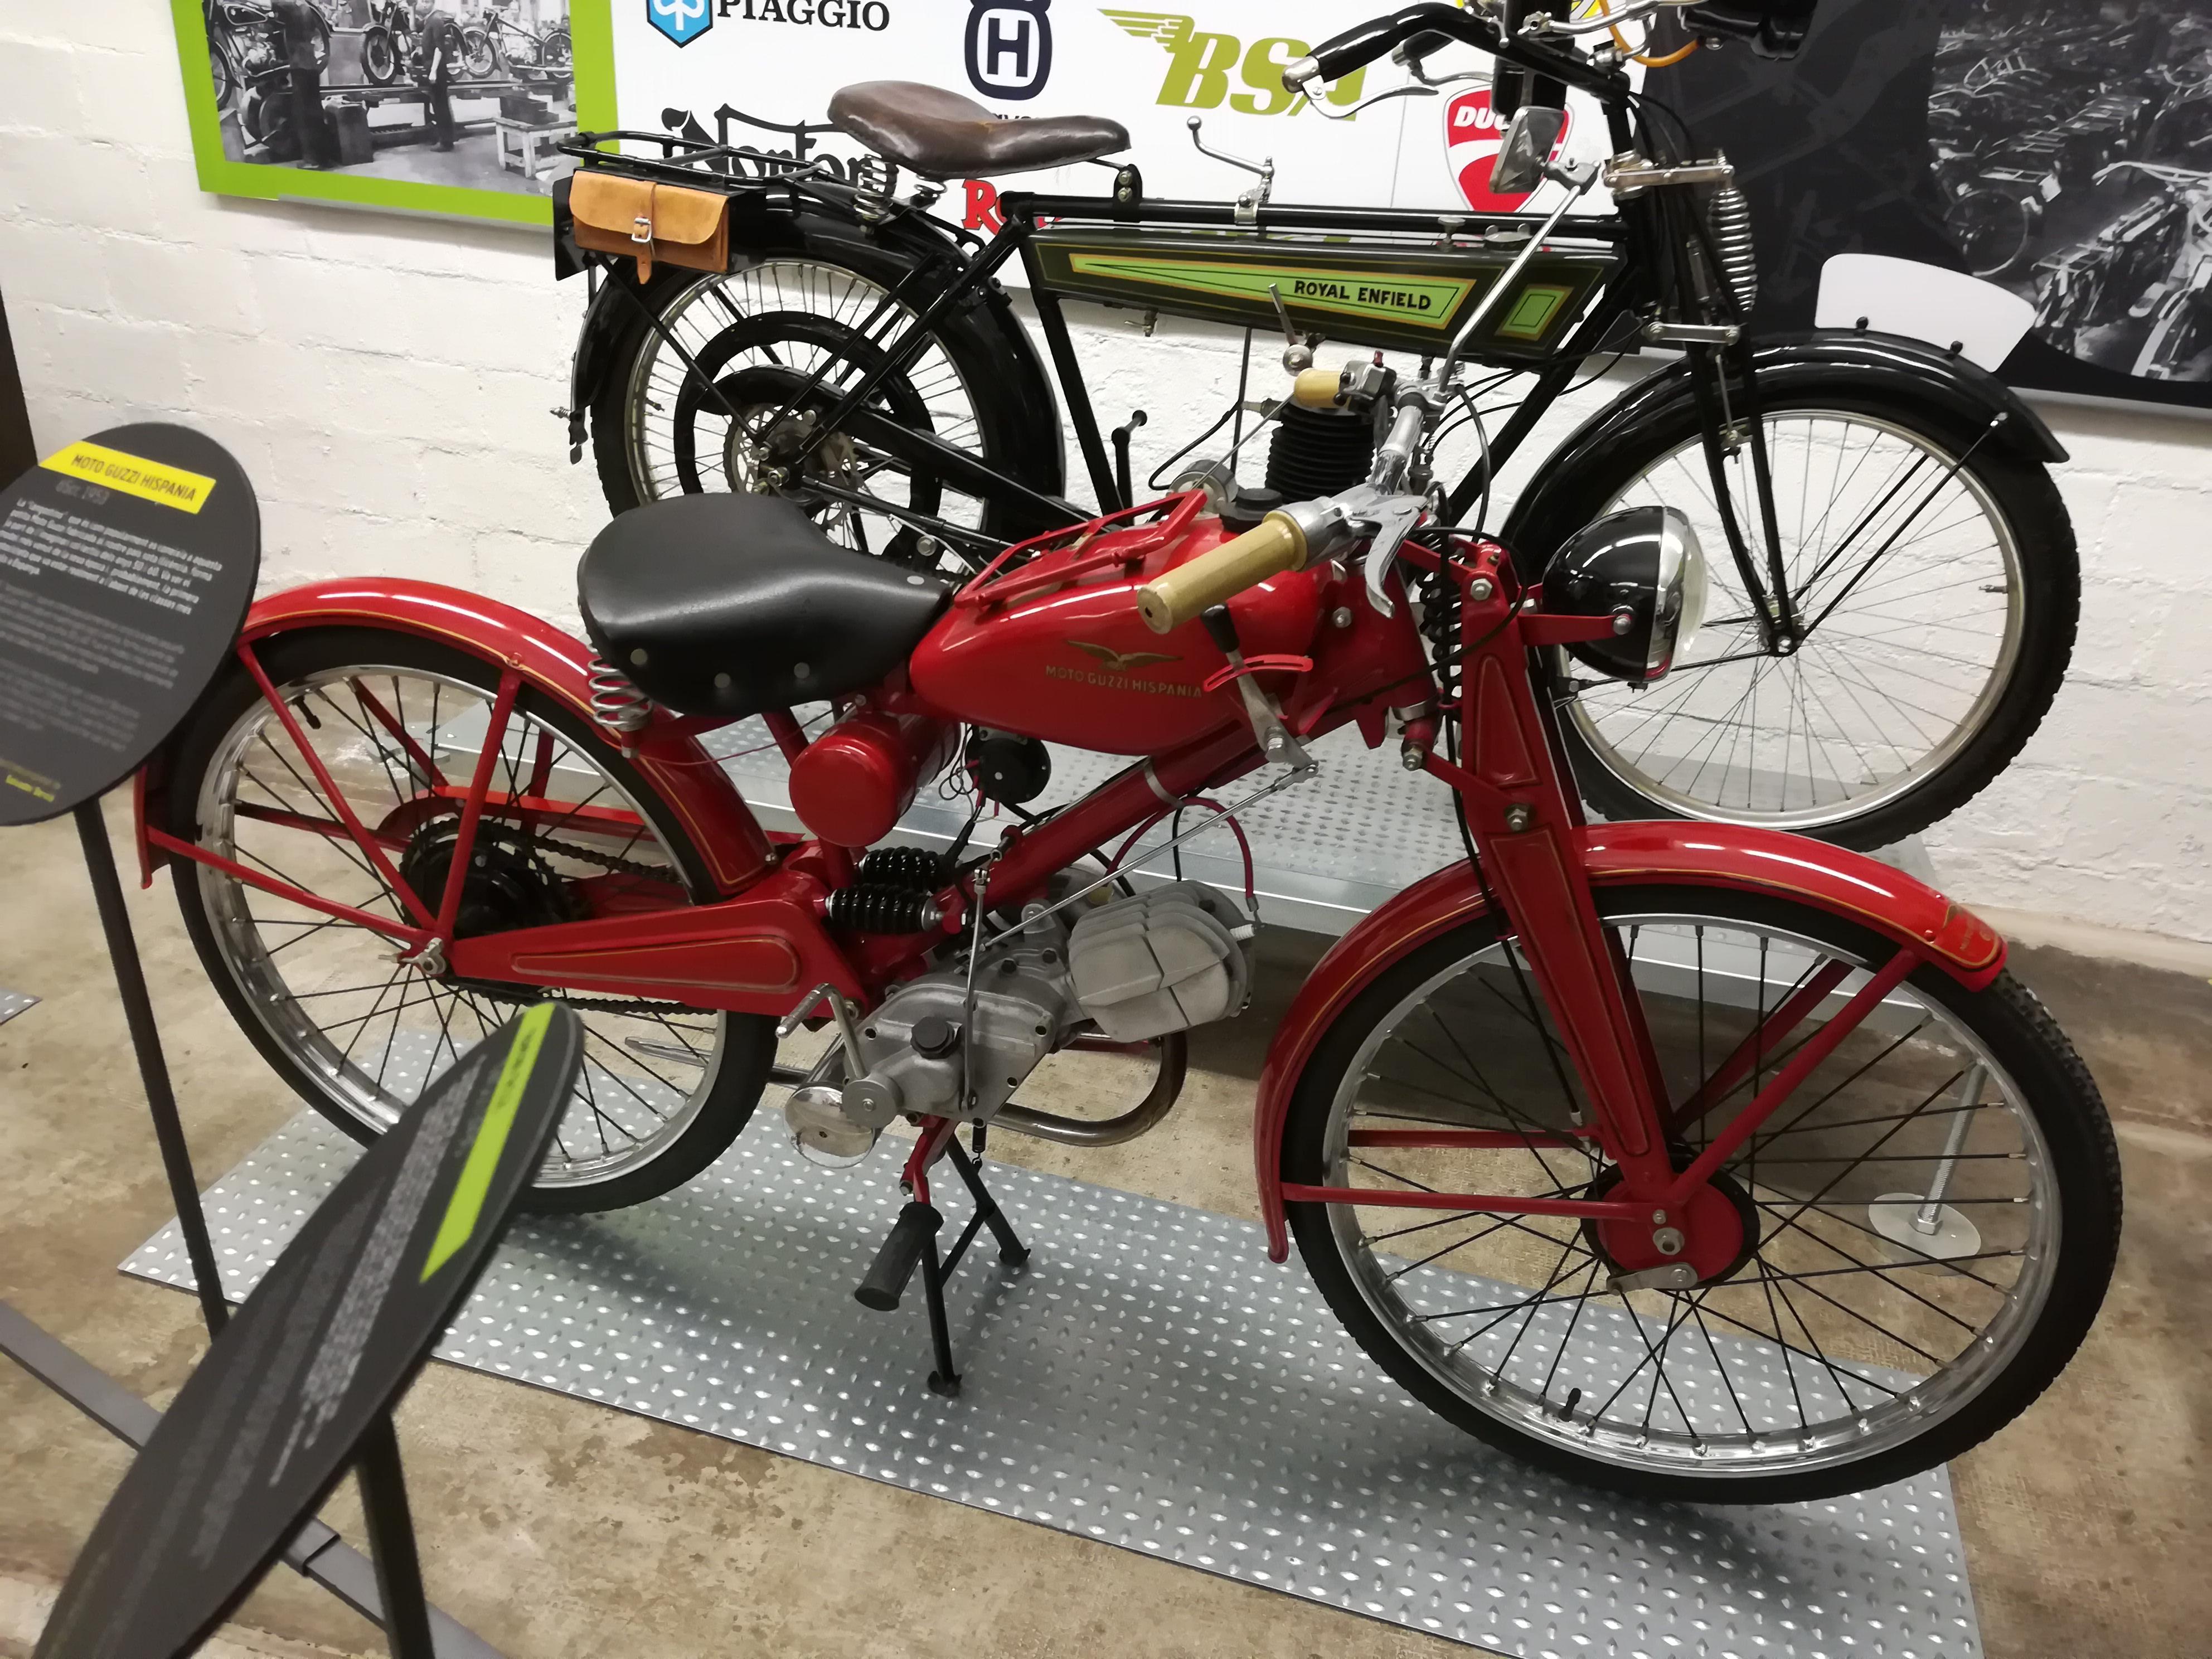 Moto Guzzi Cc Nibbio